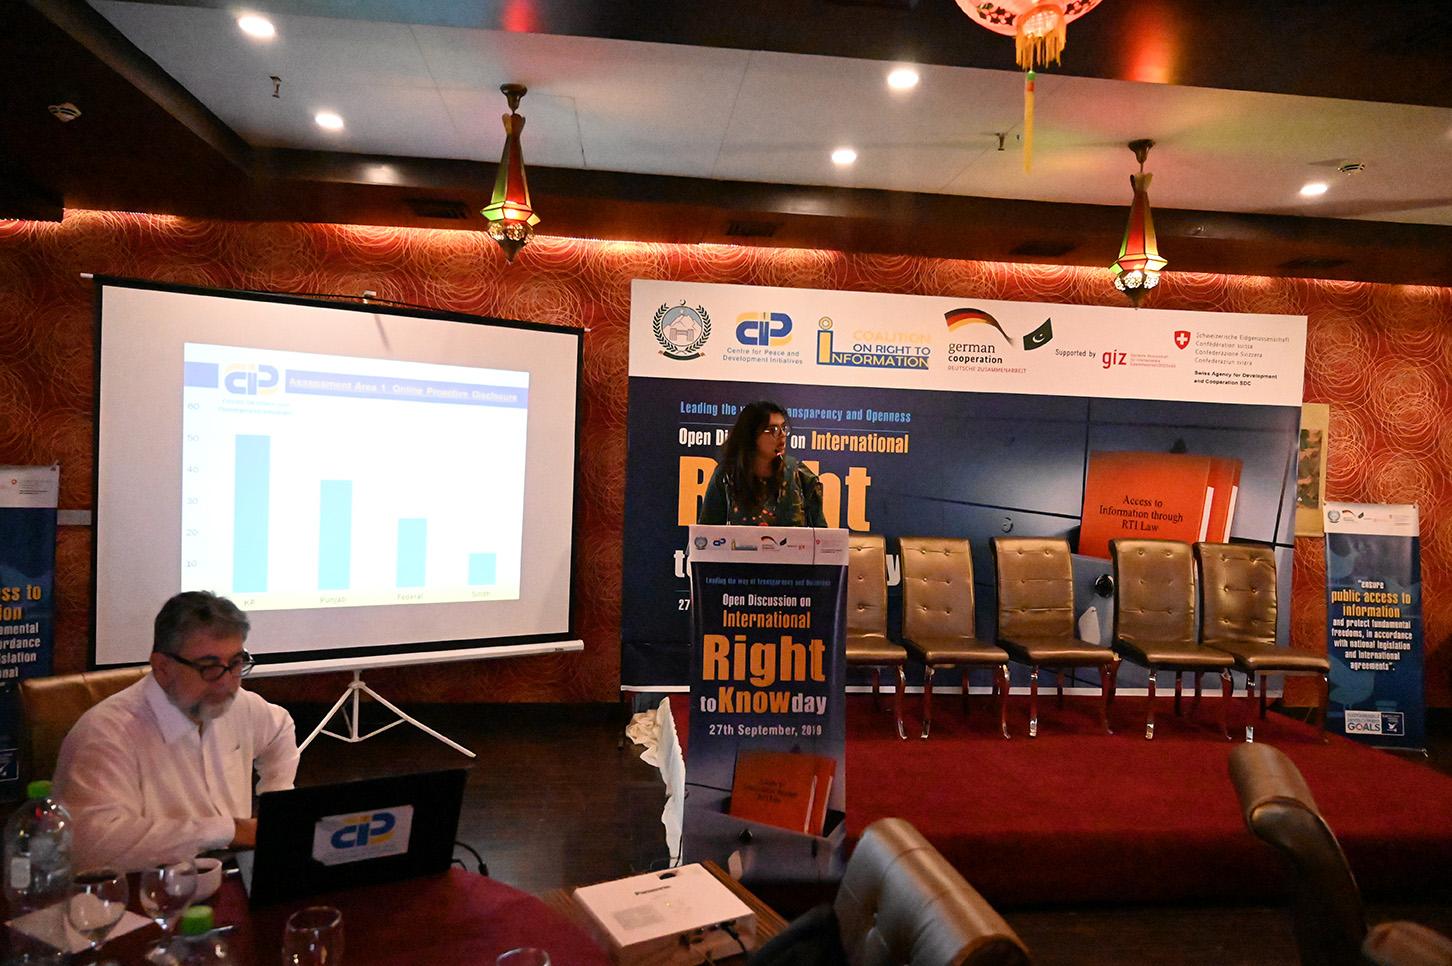 Moonus Kayinat Zahra, Program Manager CPDI shared the key findings of CPDI report on Status of RTI 2019